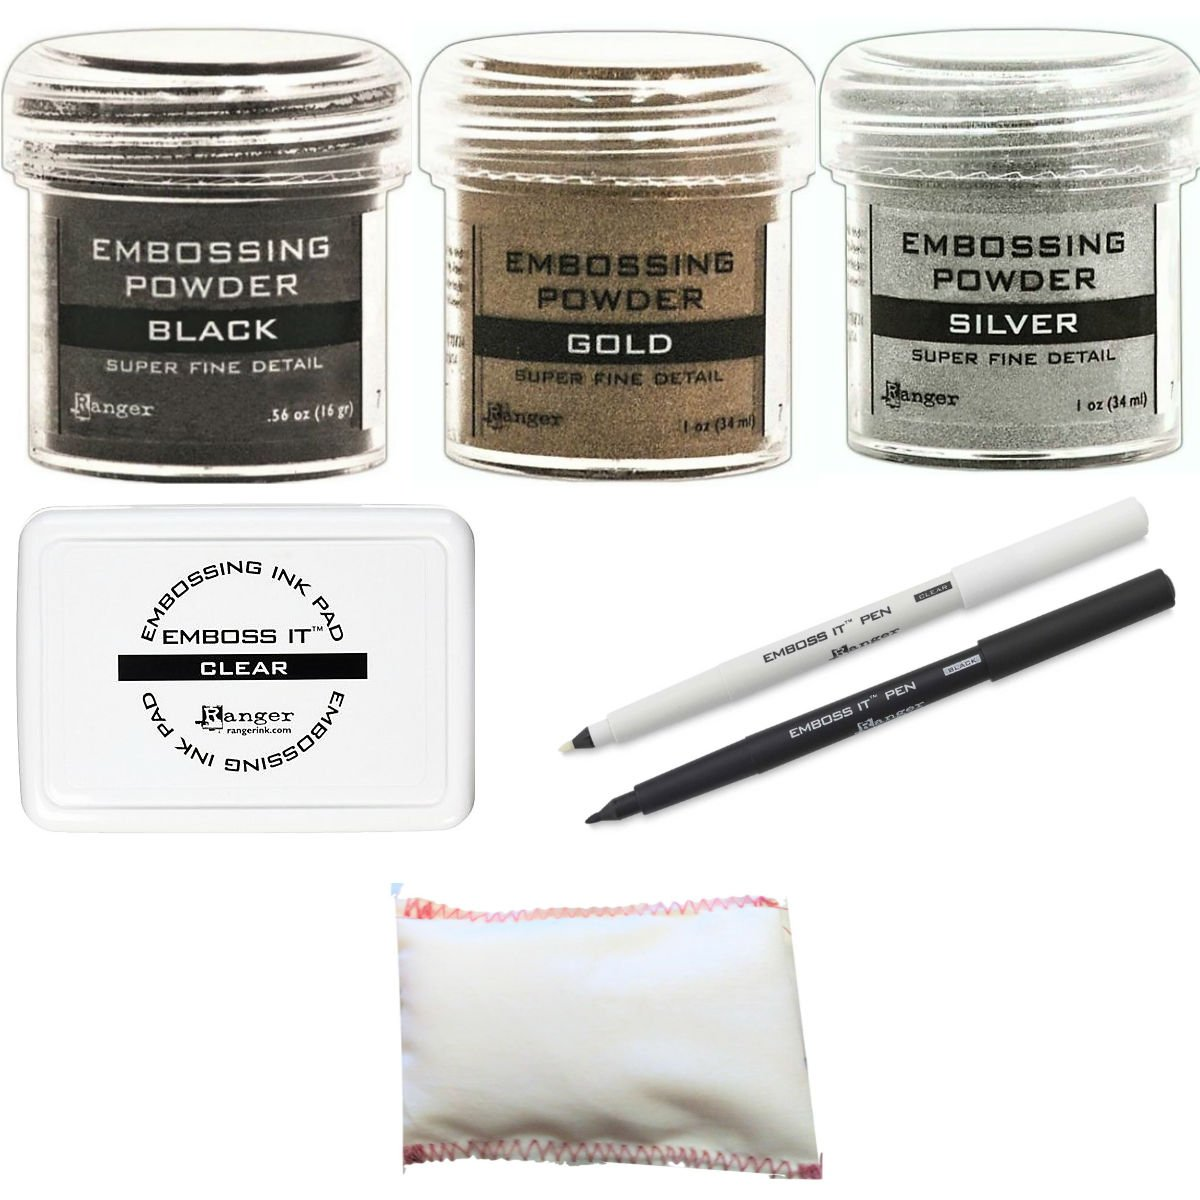 Embossing Kit Bundle - 3 Ranger Super Fine Embossing Powder, 1 Bye Bye Static Pad, 1 Ranger Emboss It Foam Pad and Two Emboss It Pens Black and Clear Various 4336866790